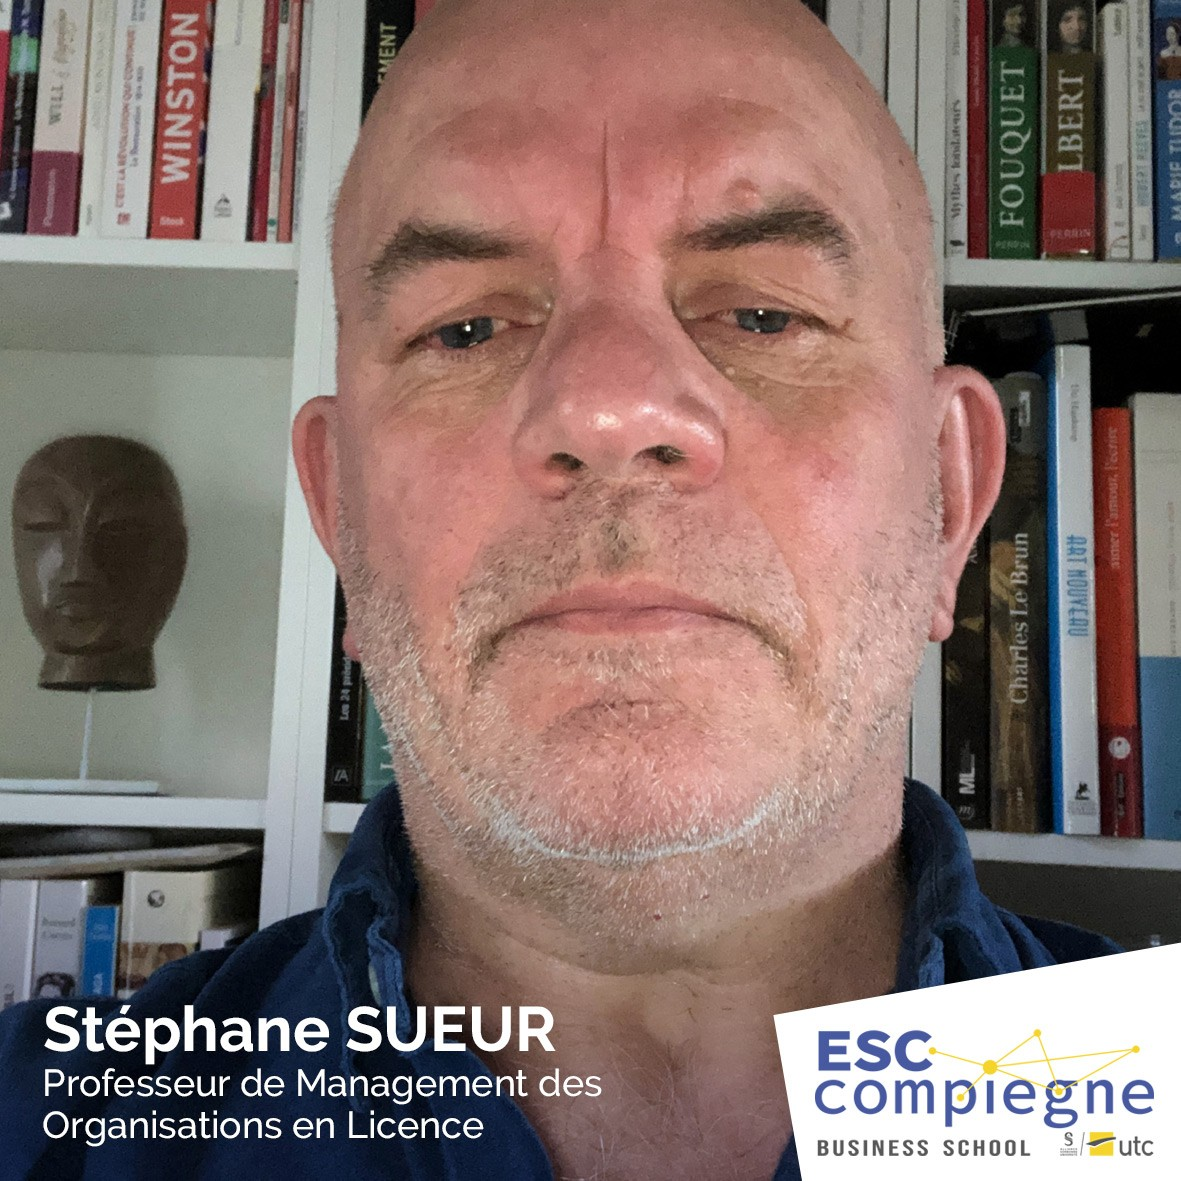 ESCC-Temoignages-Profs-Stephane-Sueur